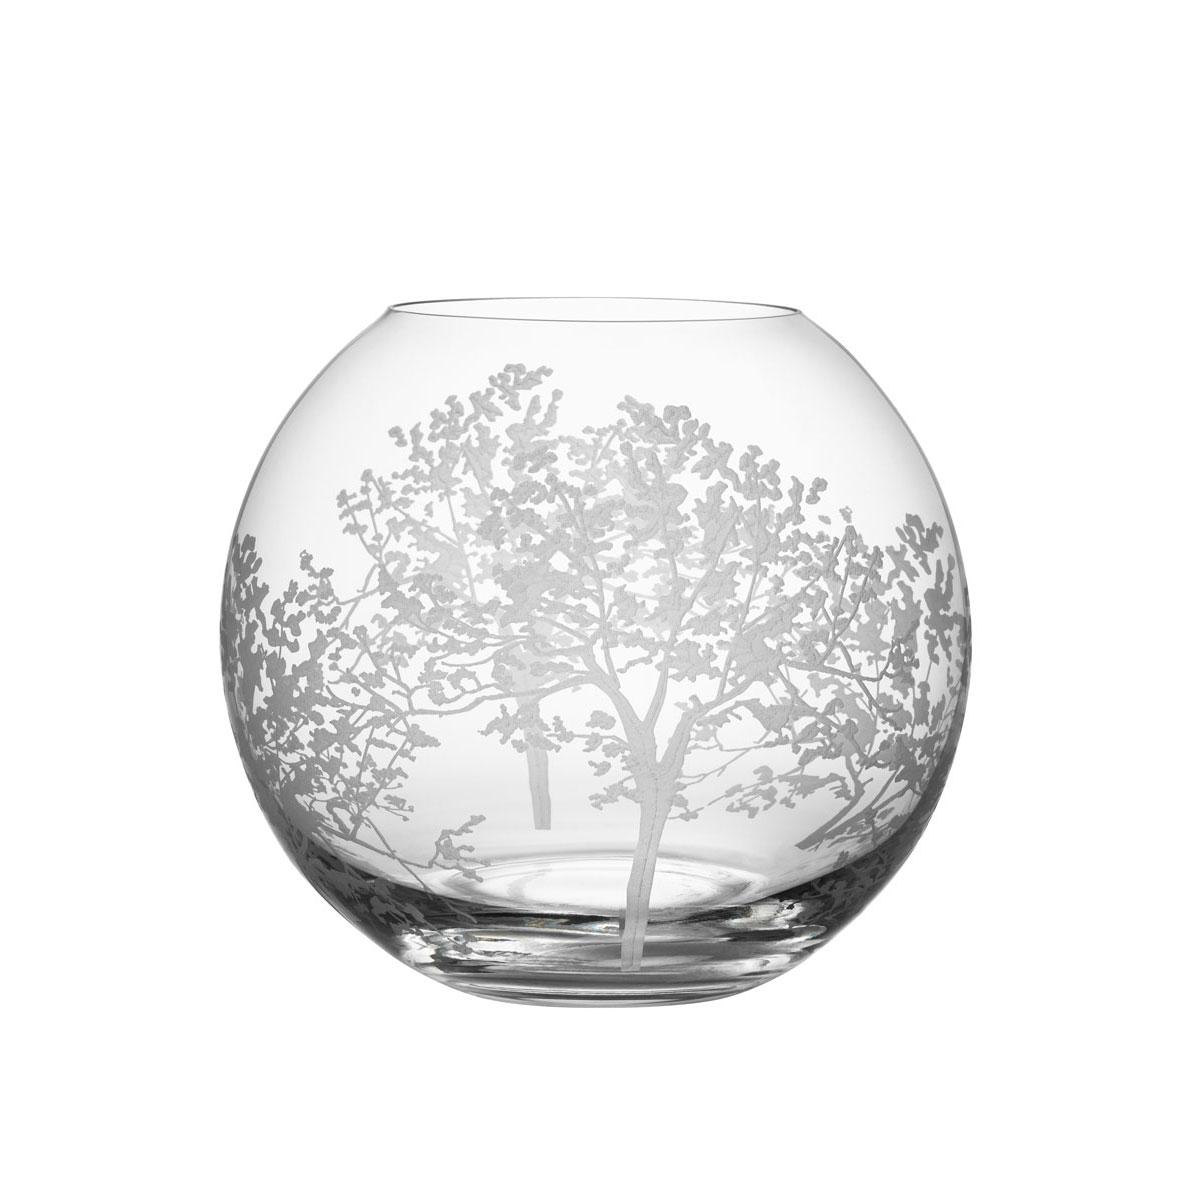 Orrefors Crystal Organic Vase Small